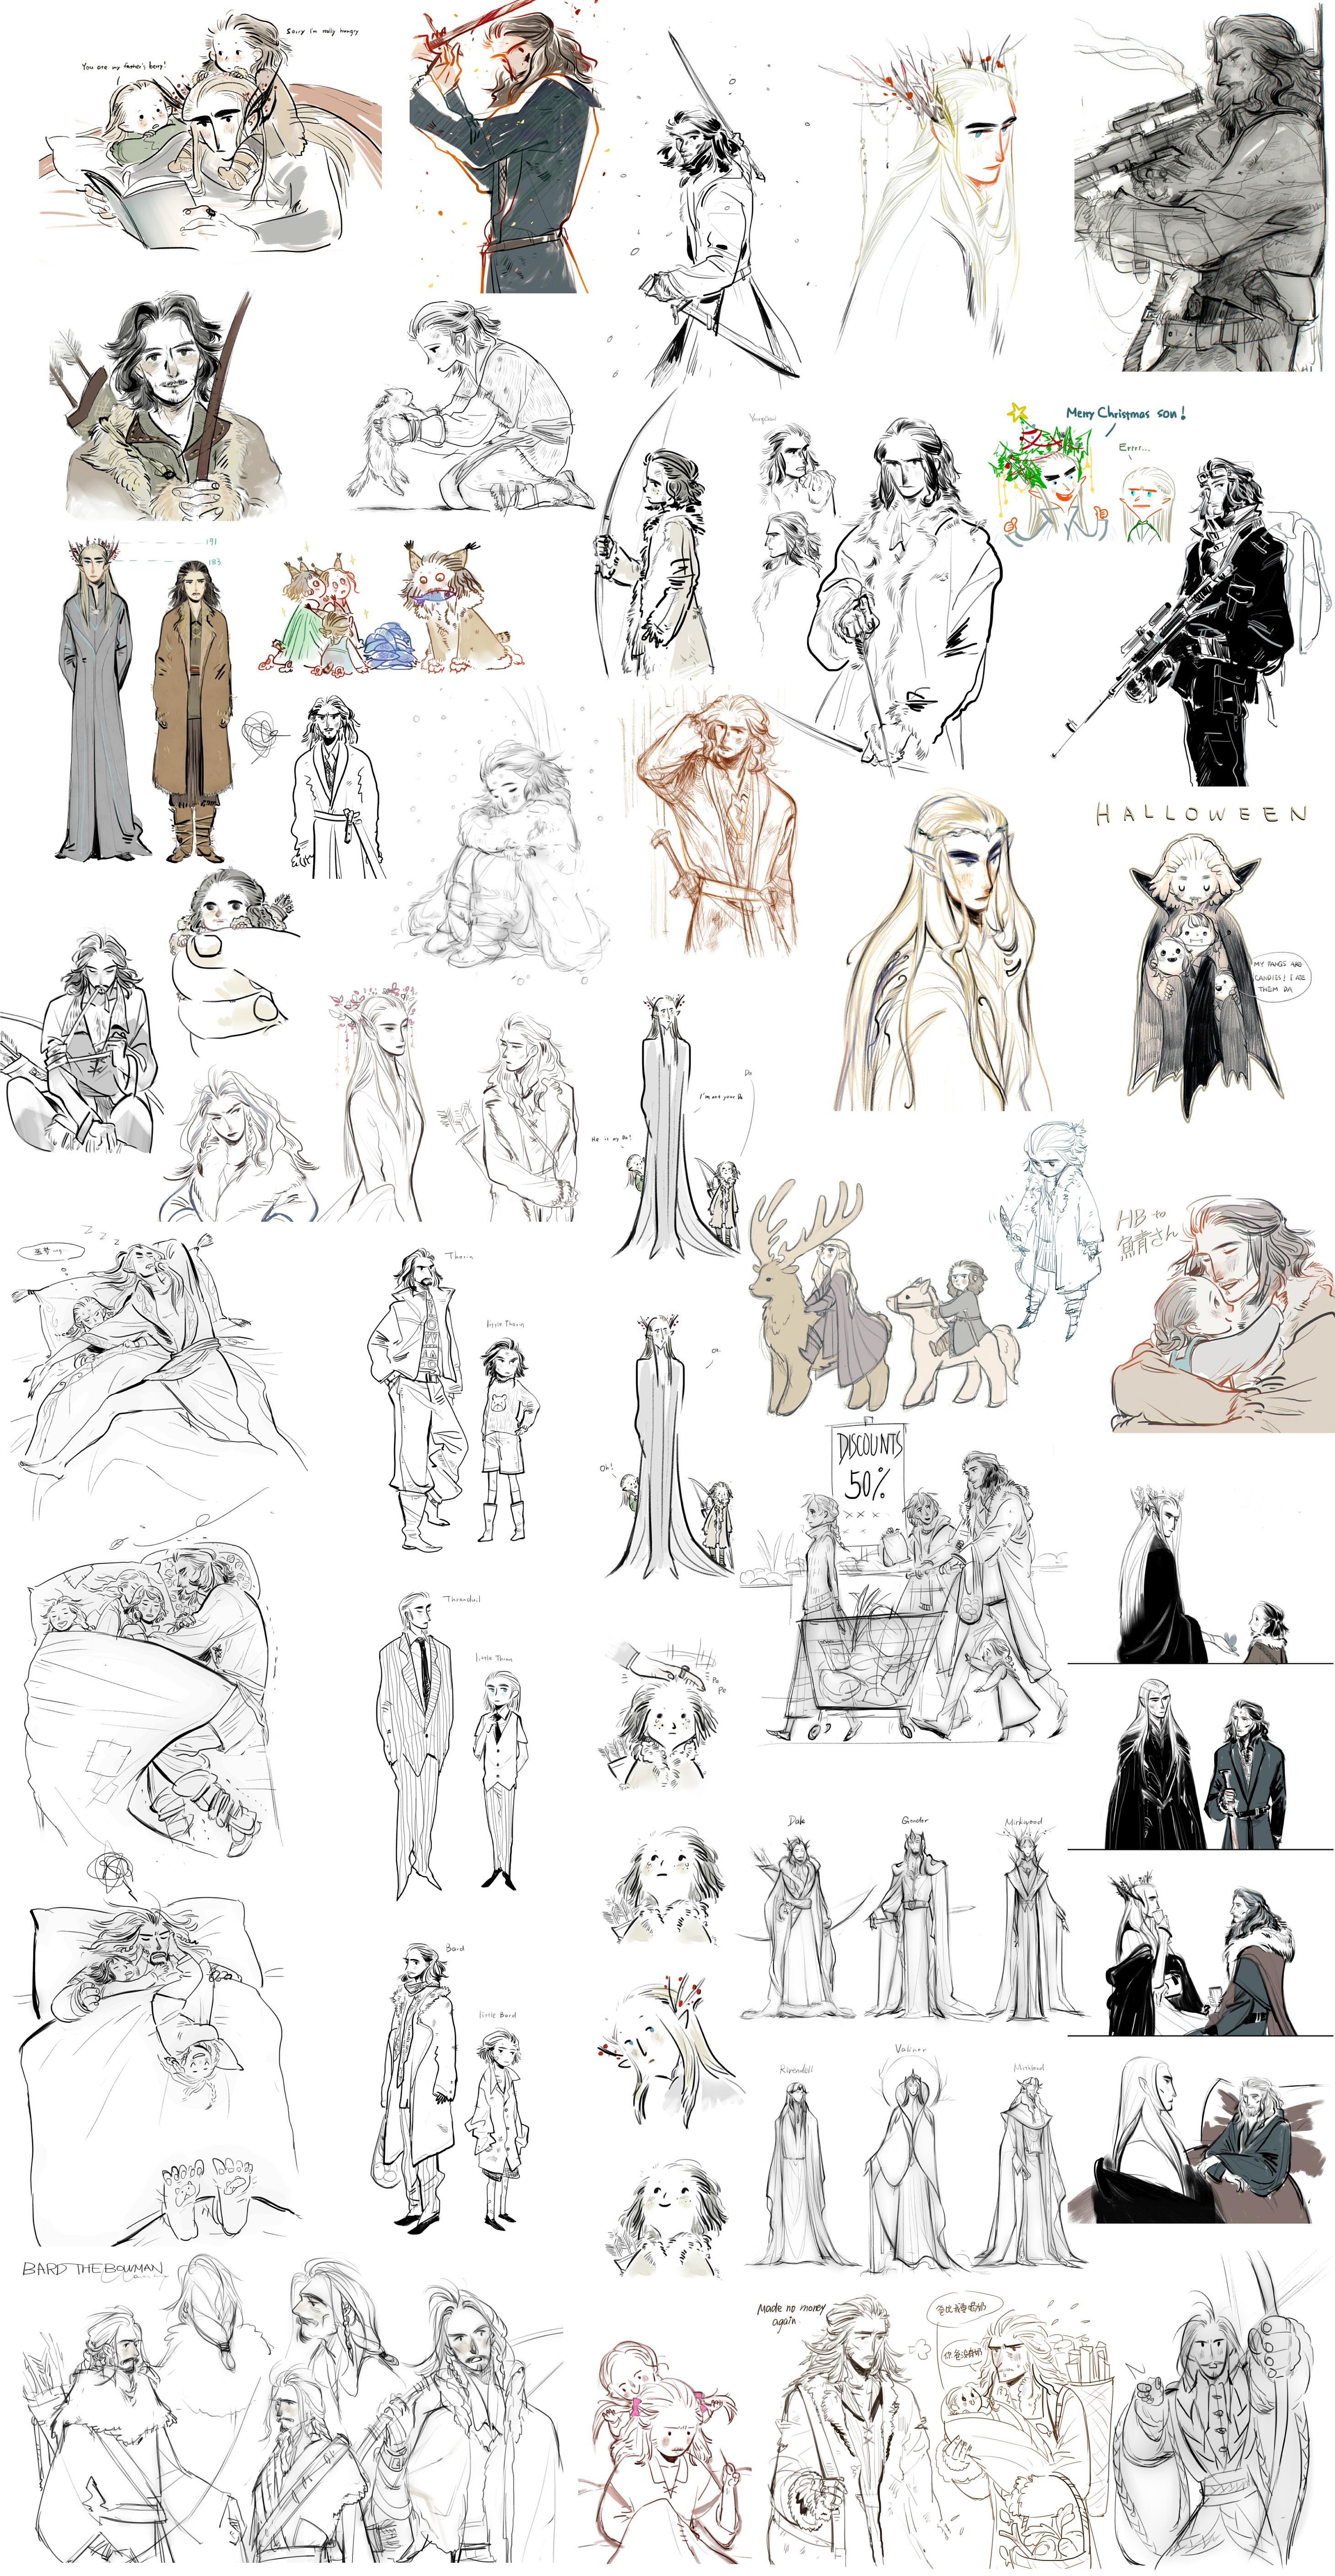 hobbit sketch by Wavesheep